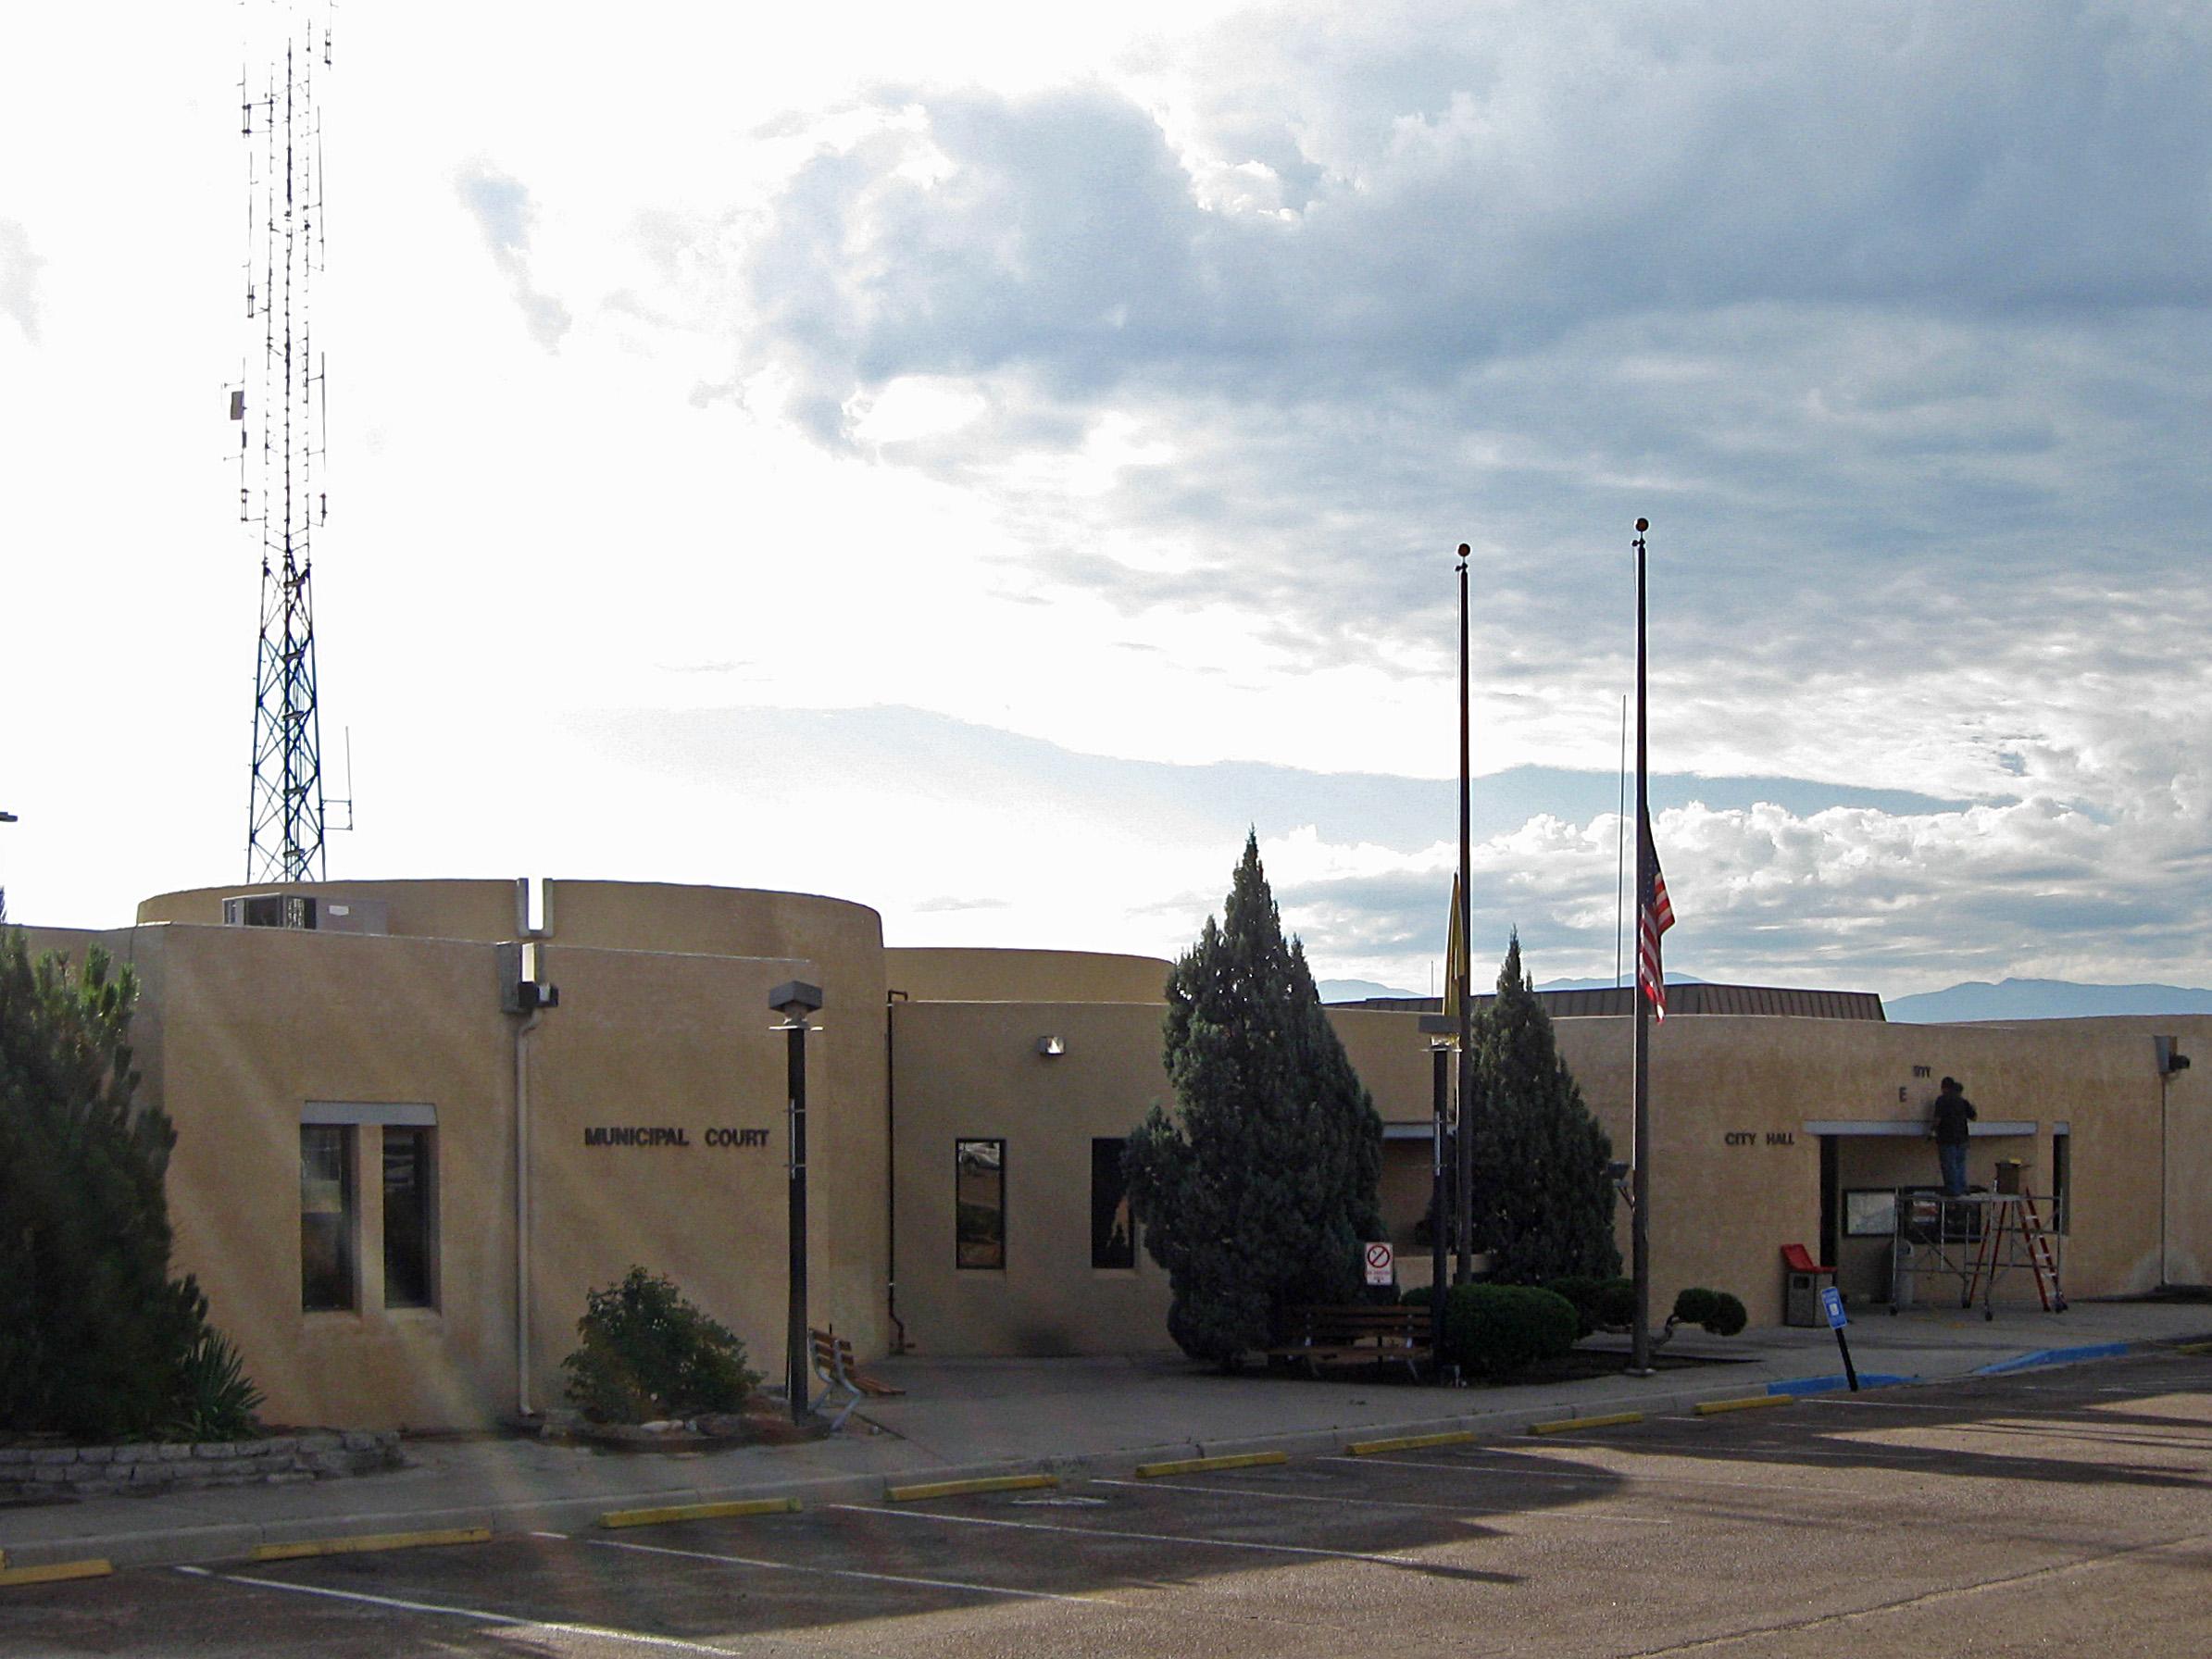 File:Espanola New Mexico City Hall.jpg - Wikipedia, the freeespanola city